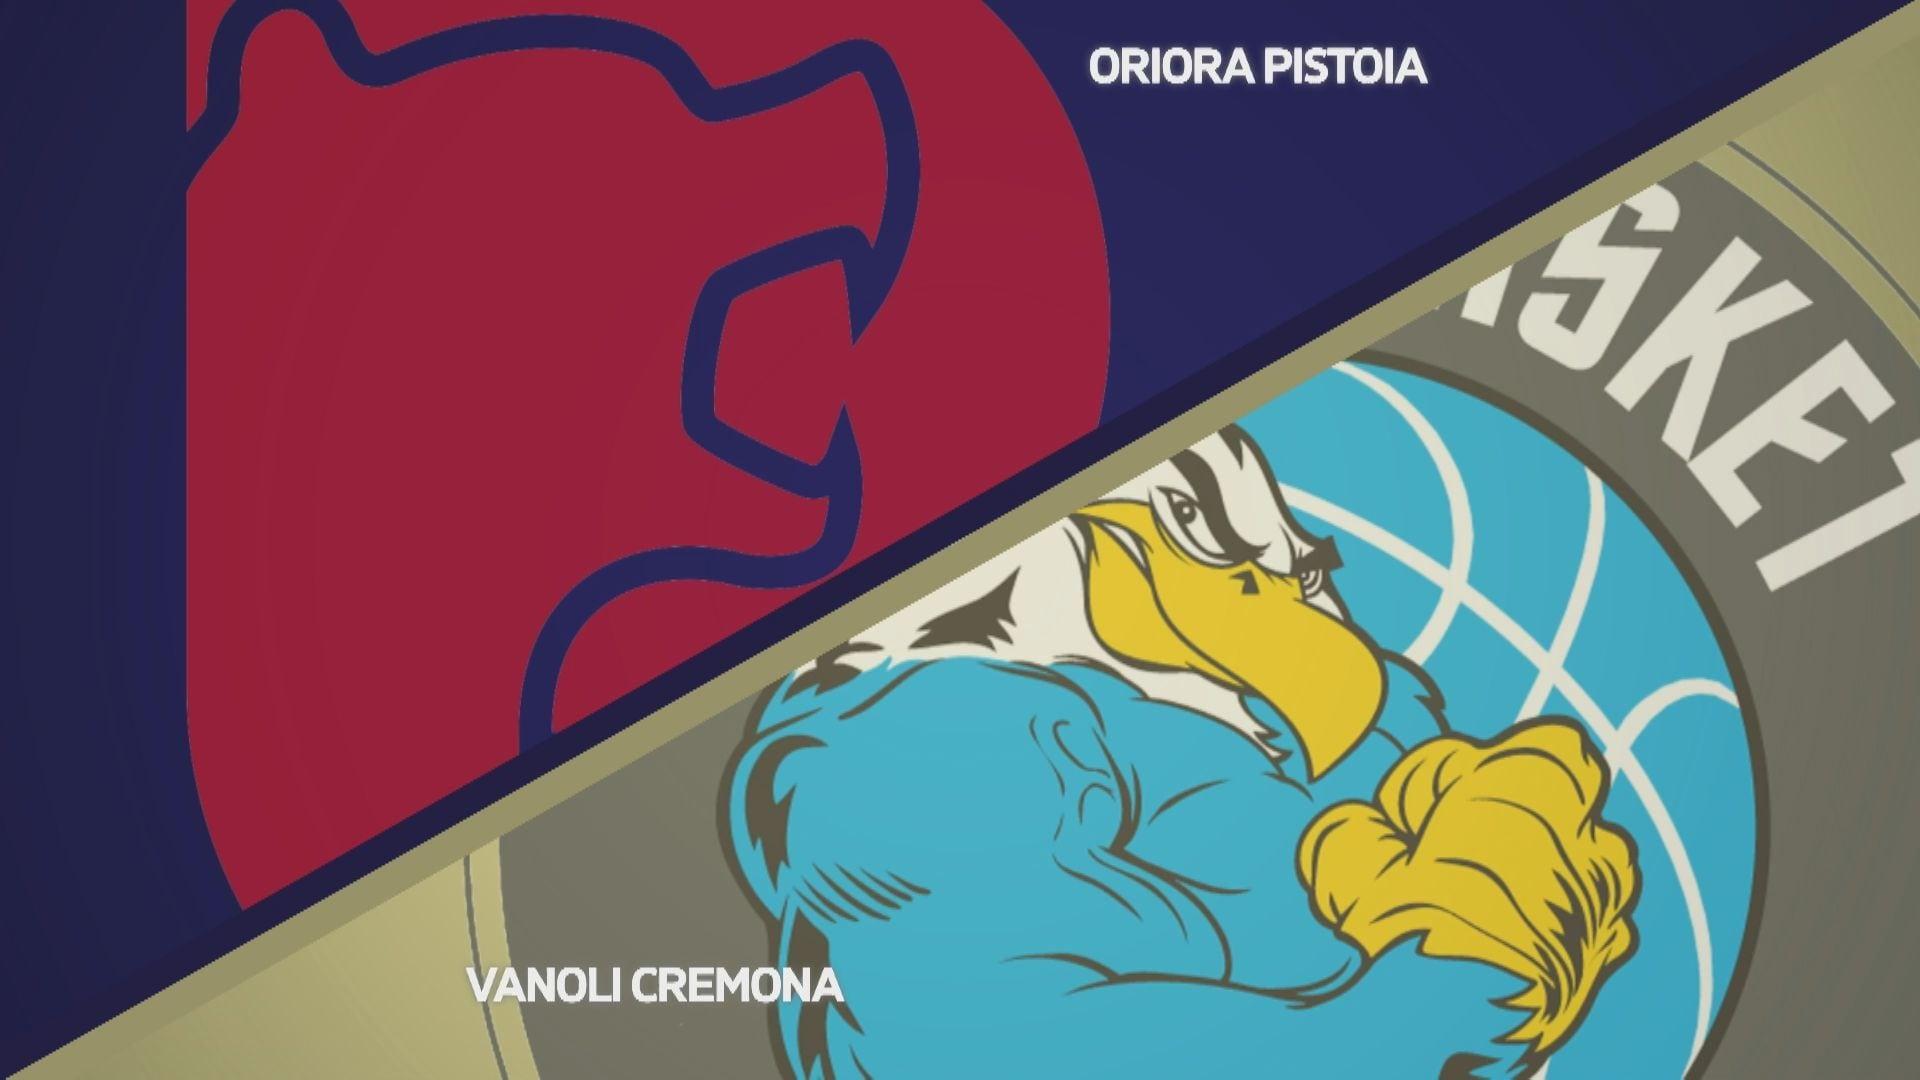 Oriora Pistoia - Vanoli Cremona 84-71